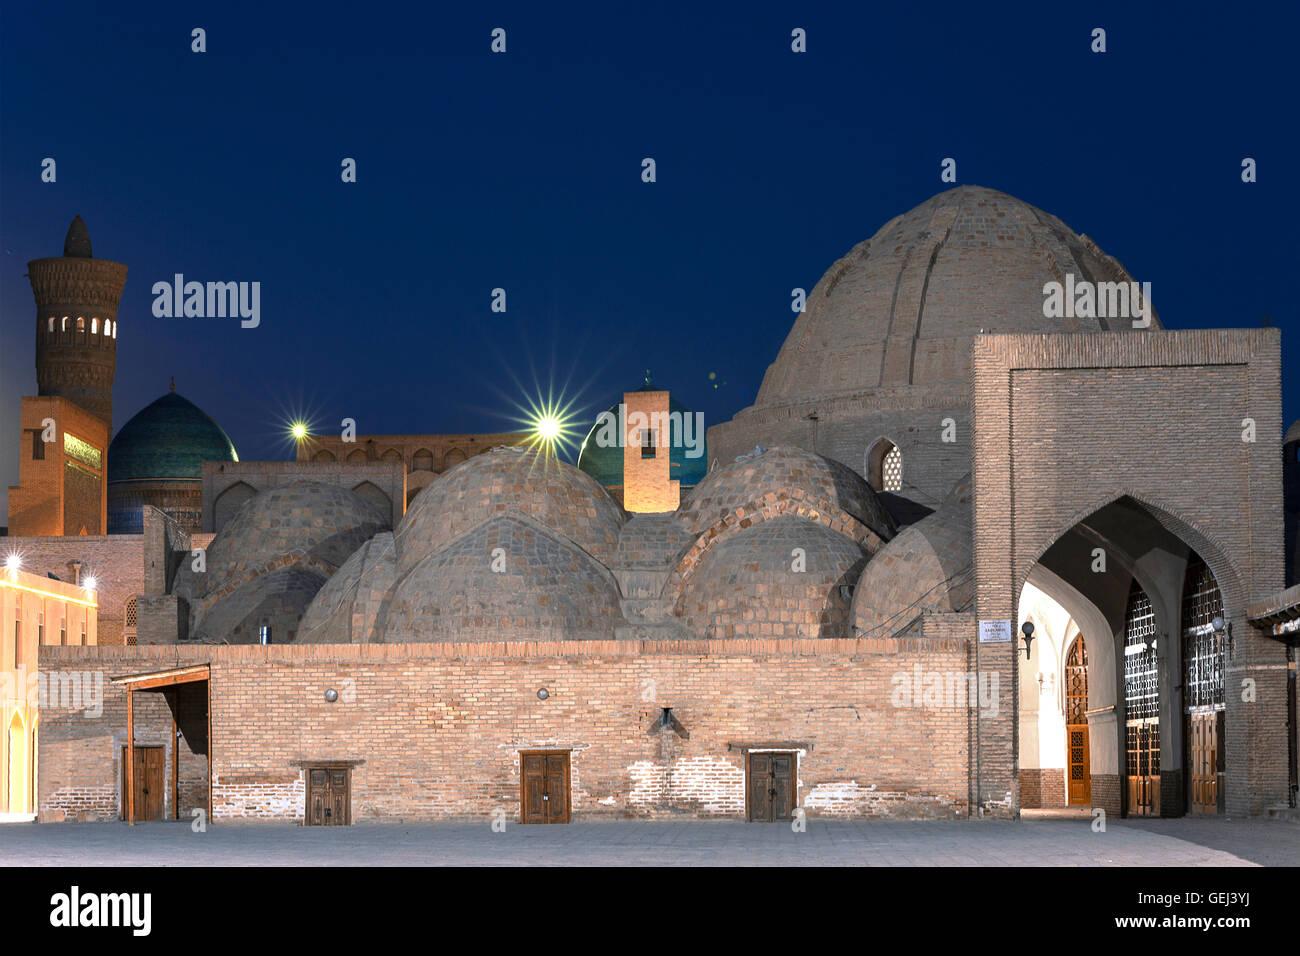 Domed bazaar in Bukhara, Uzbekistan. Stock Photo